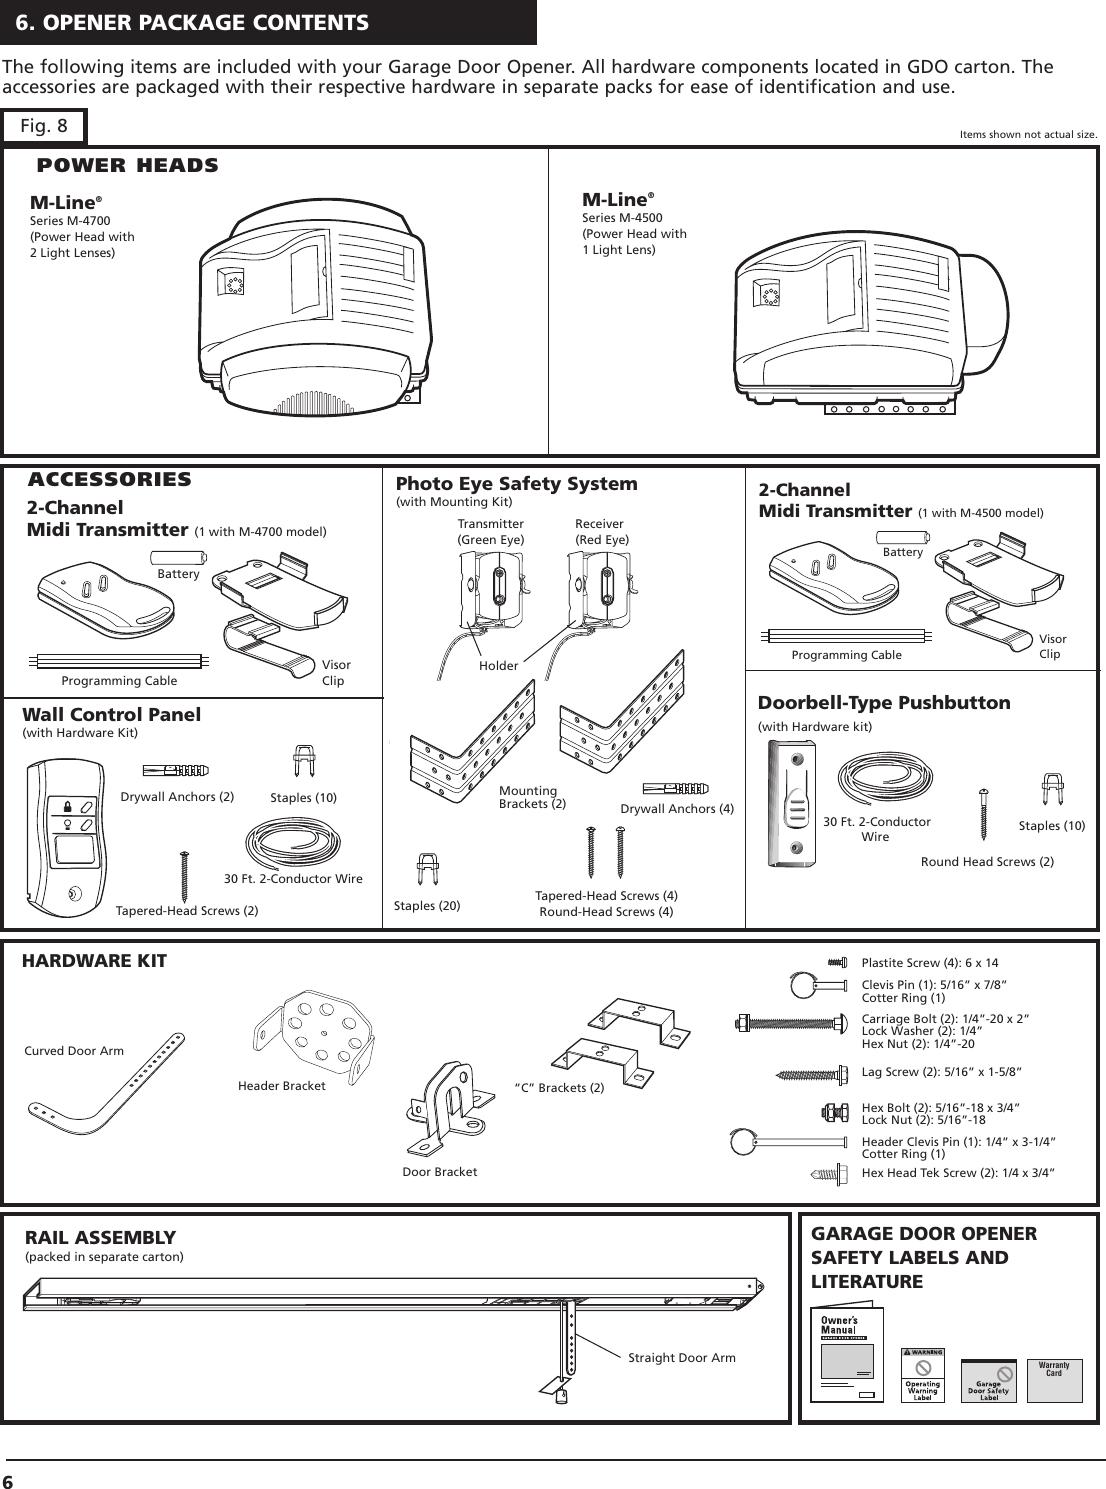 Genie Garage Door Opener M 4500 Users Manual ML 32, 1, 2, 31_2 on